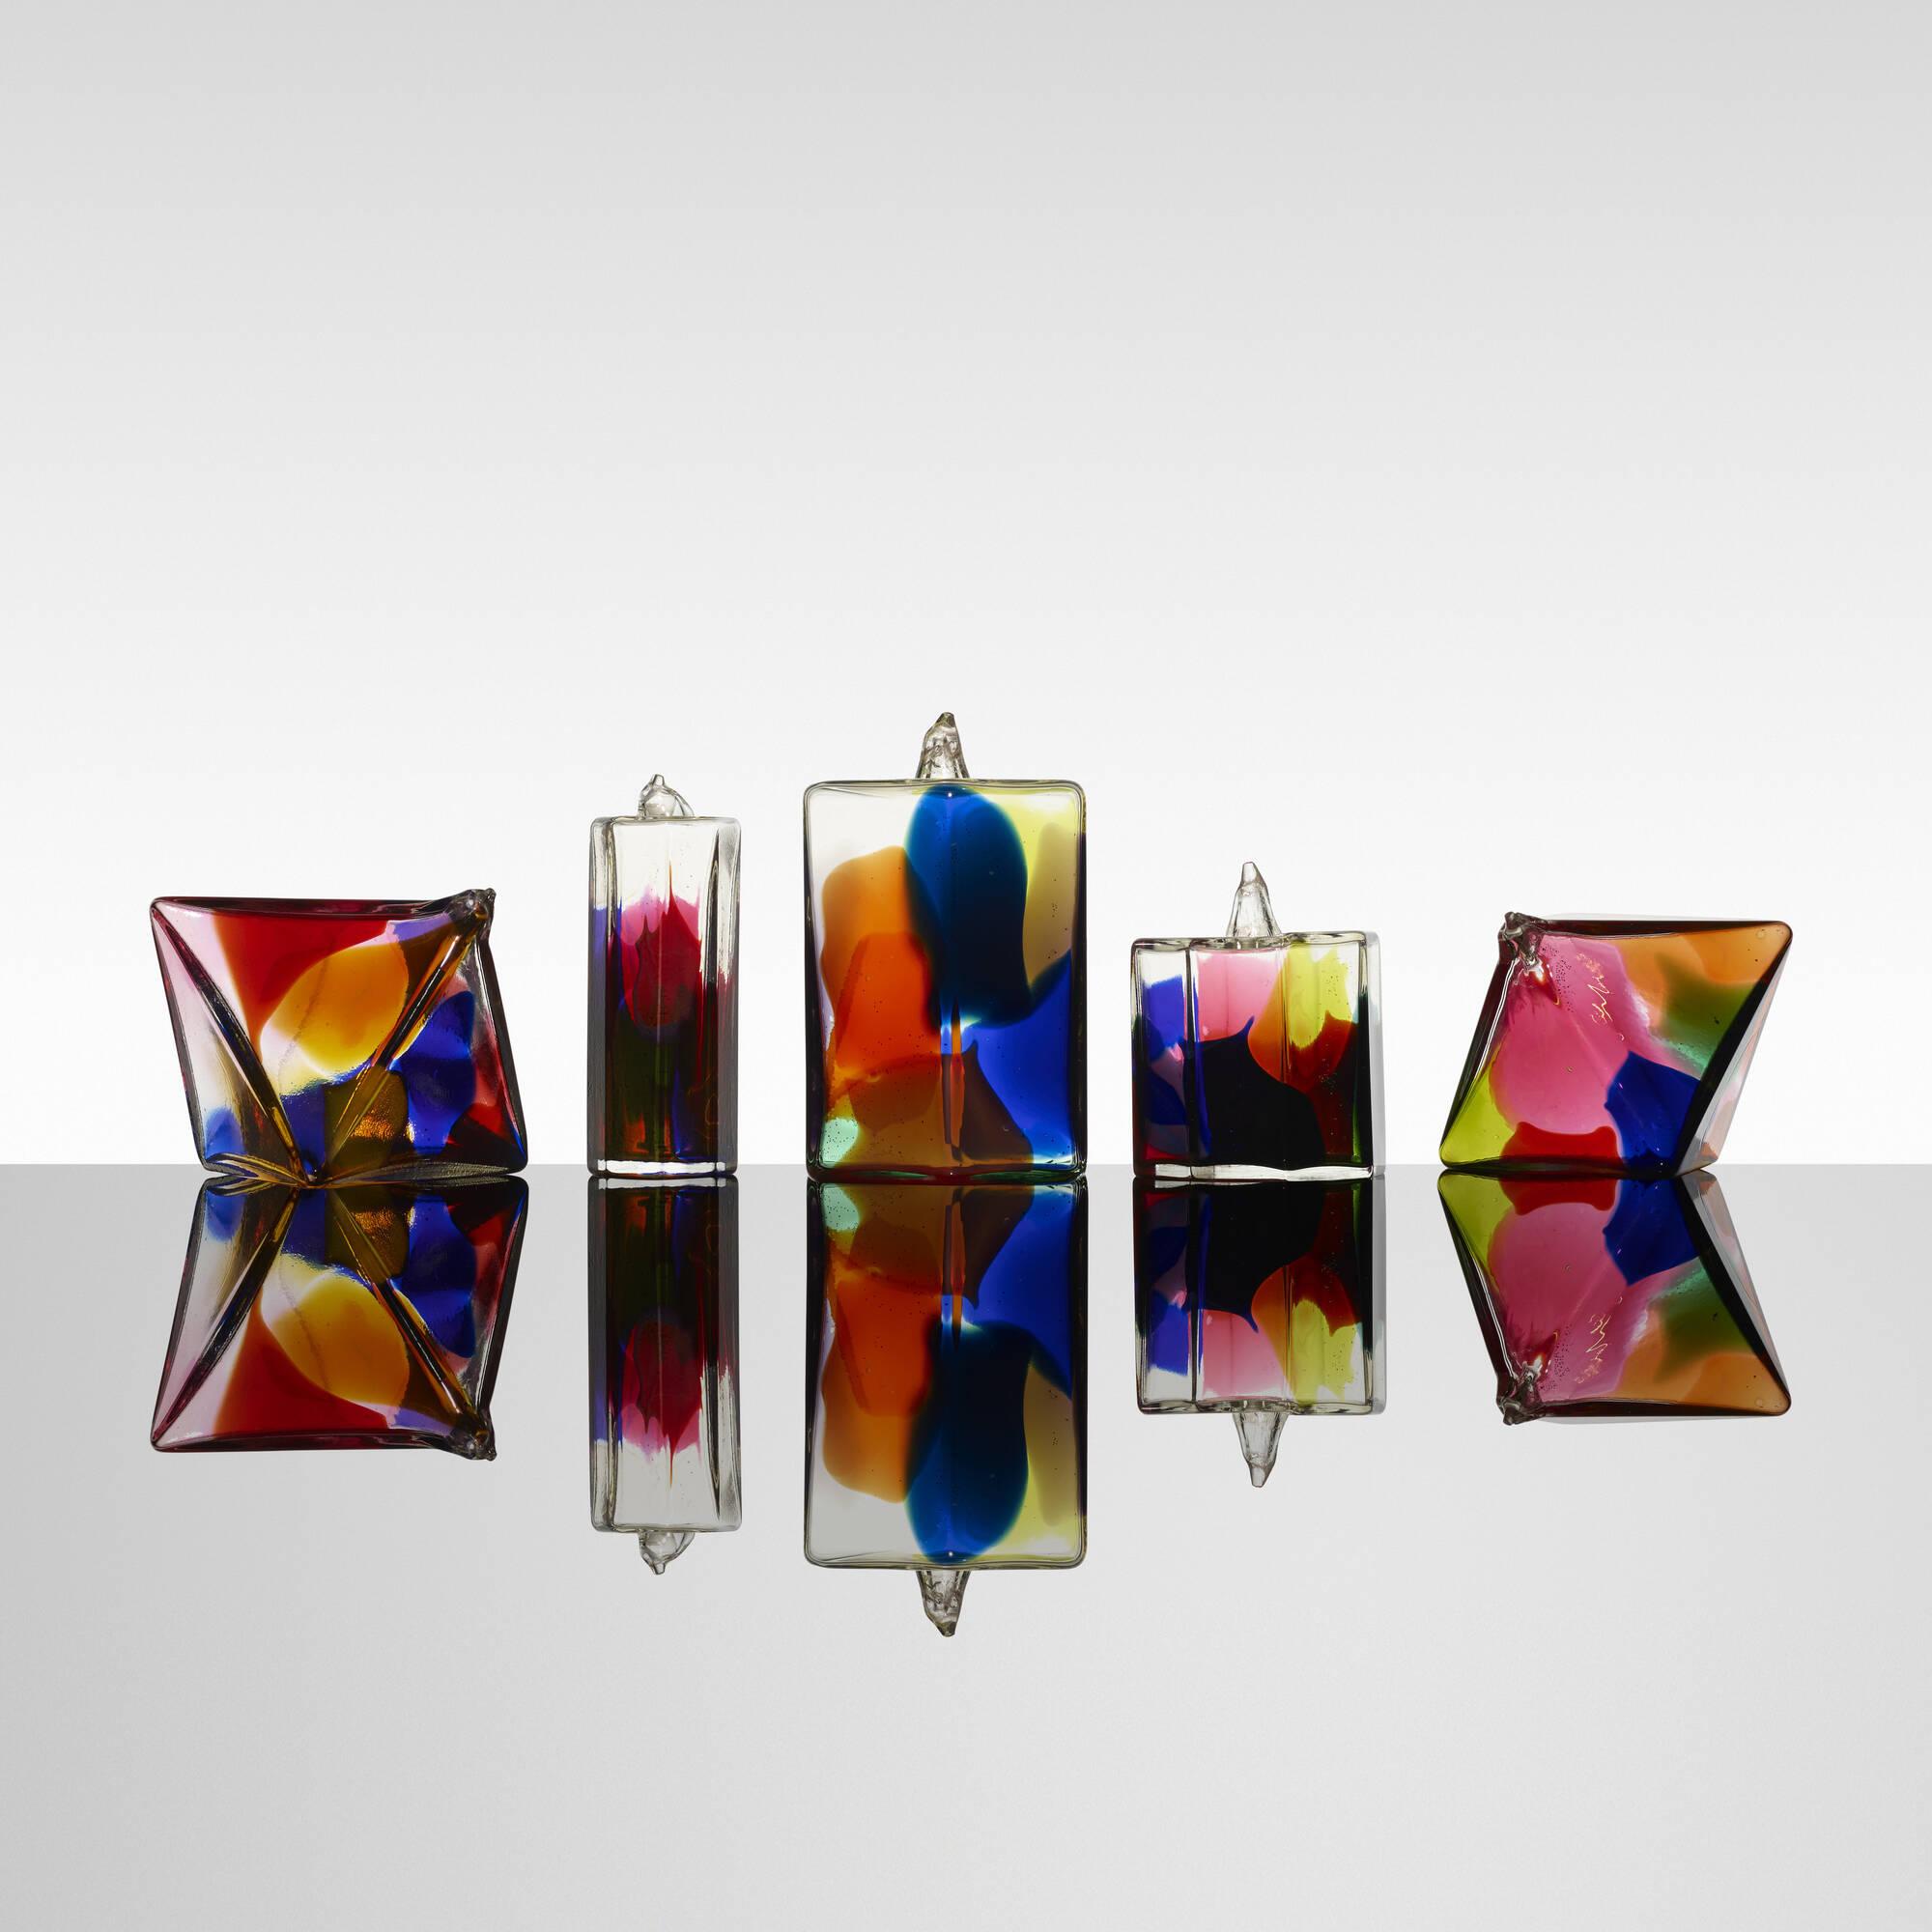 146: Paul Seide / Crystal Construction (1 of 7)